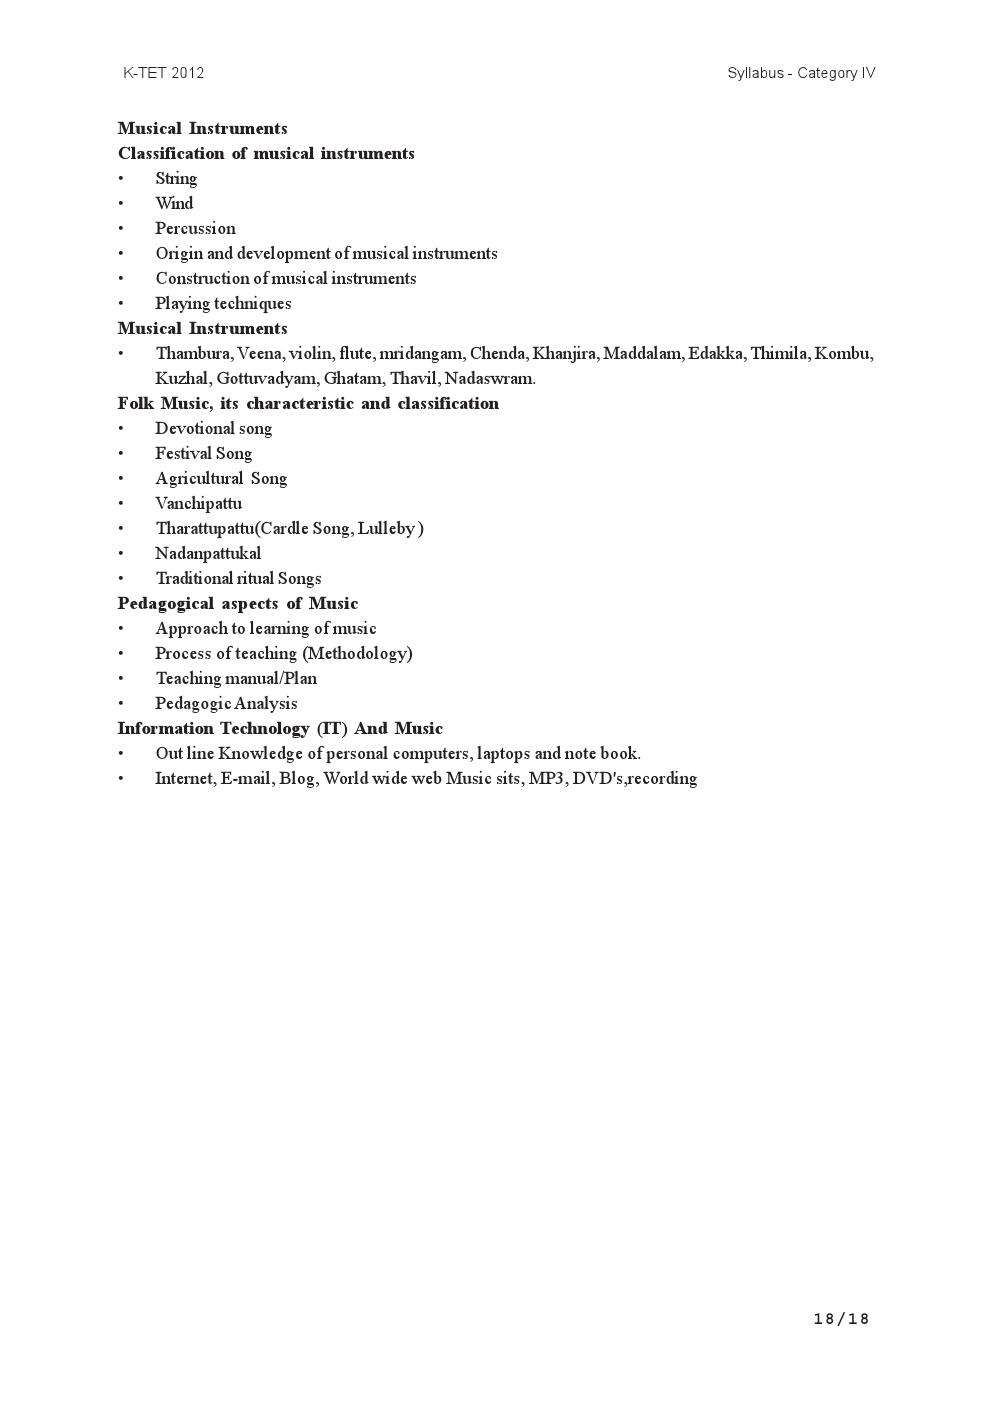 http://masterstudy.net/pdf/syllabus40018.jpg